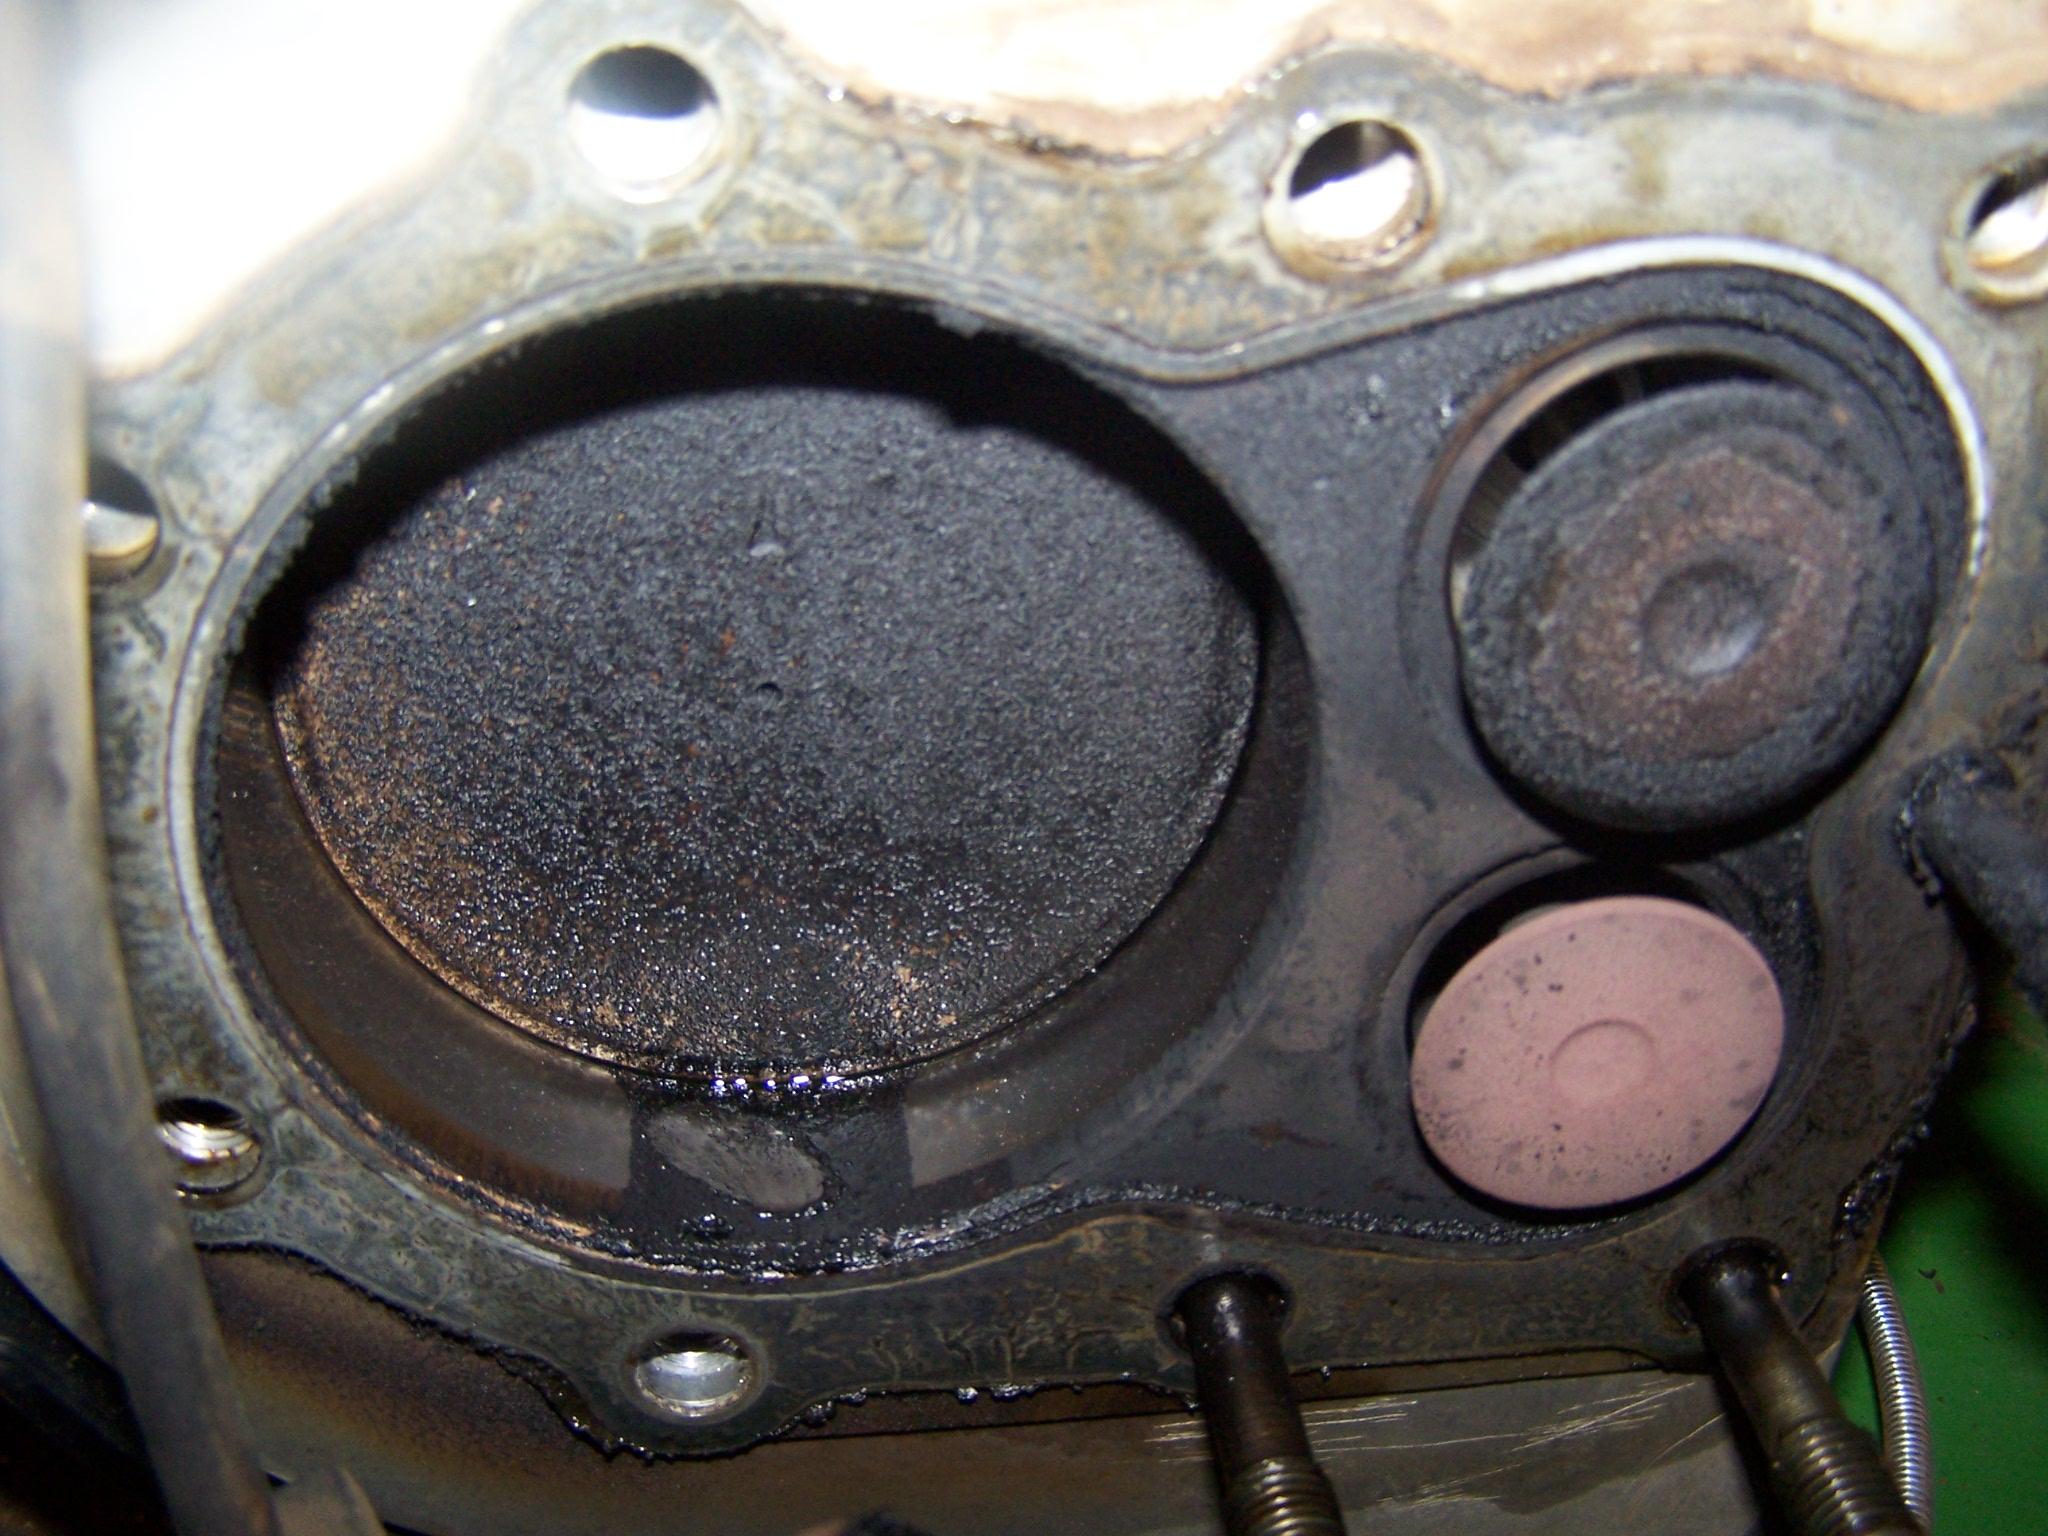 Golf Cart Kawasaki Engine Troubleshooting Basic Instruction Manual Fb460v Wiring Diagram Controller Toyota Window Switch Ezgo Gas Engines Harley